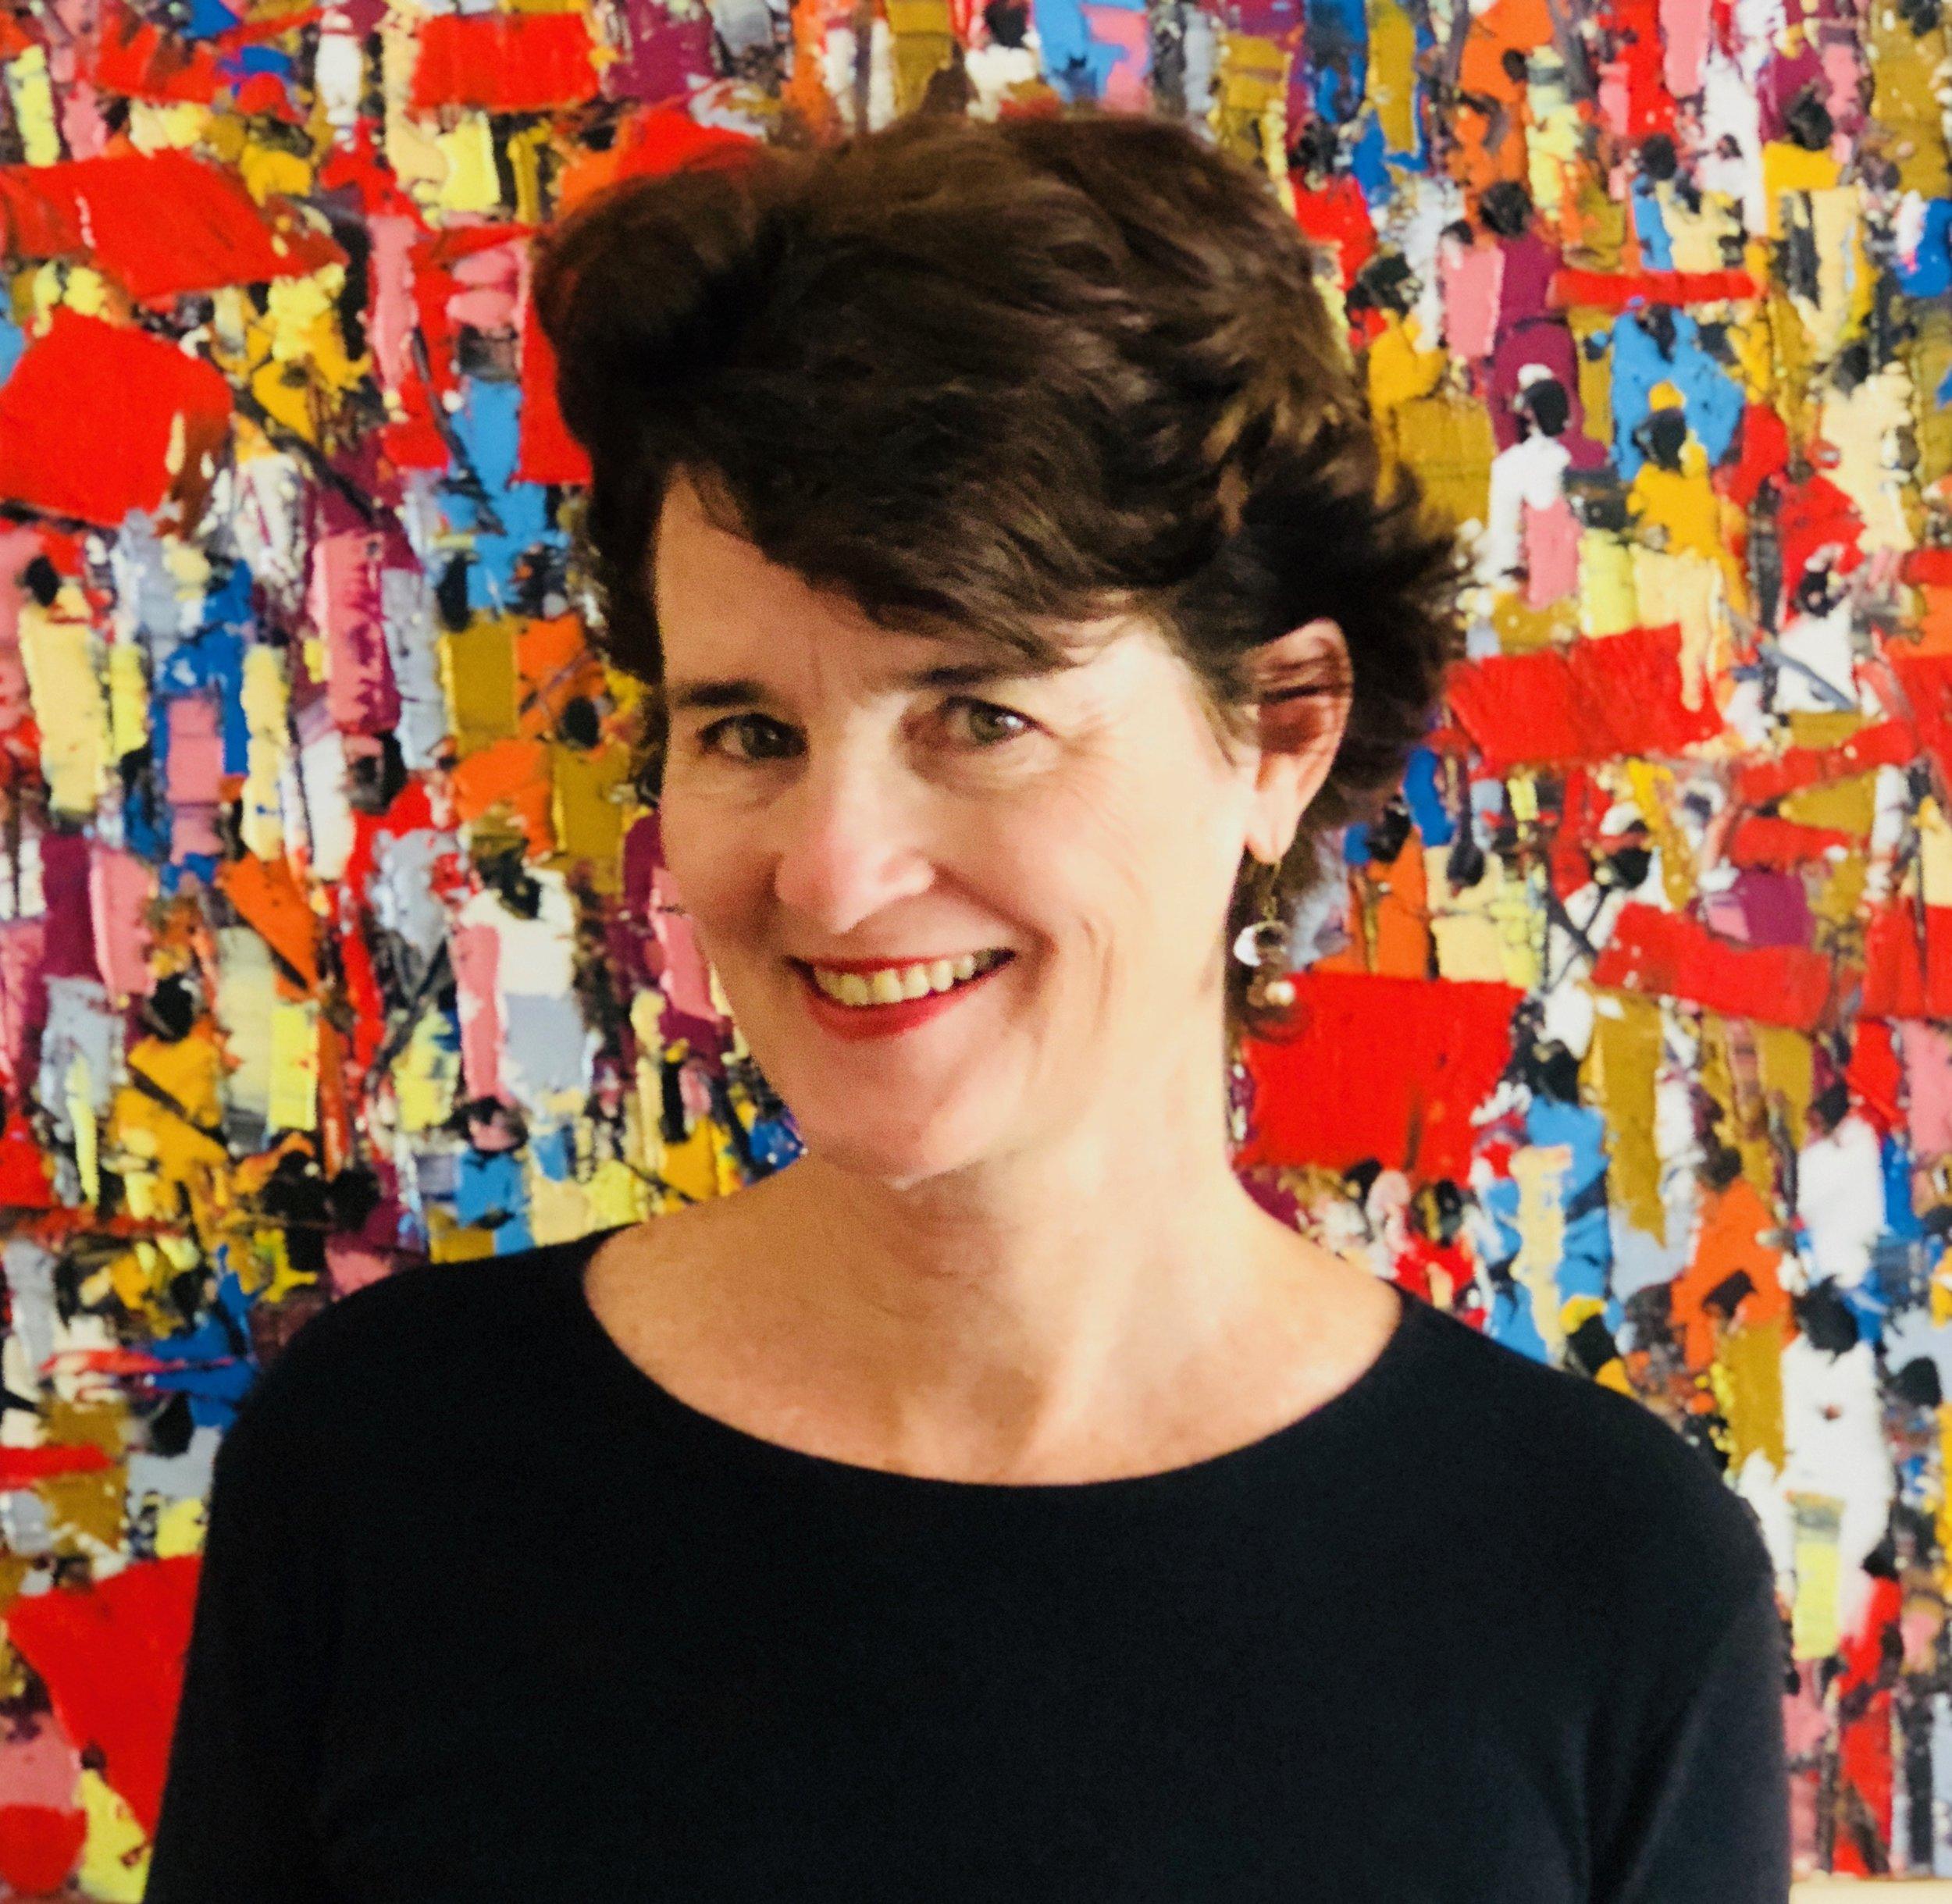 Lisa headshot Ghana painting 9%2F2%2F18JPG.jpg